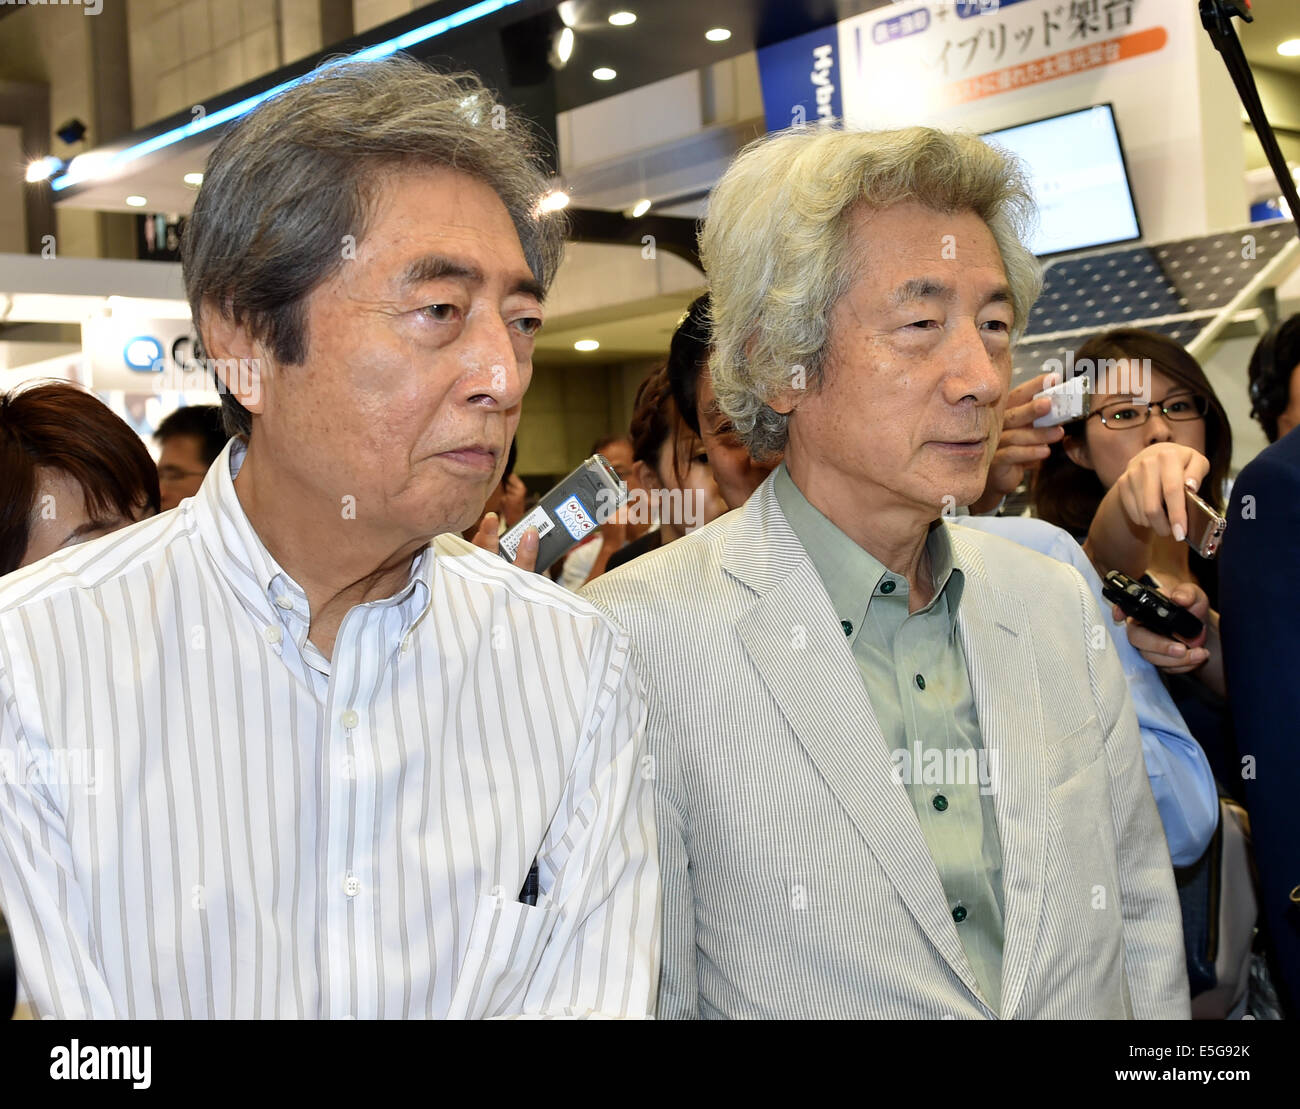 July 31, 2014, Tokyo, Japan - Japan's former Prime Ministers Junichiro Koizumi, right, and Morihiro Hosokawa, - Stock Image